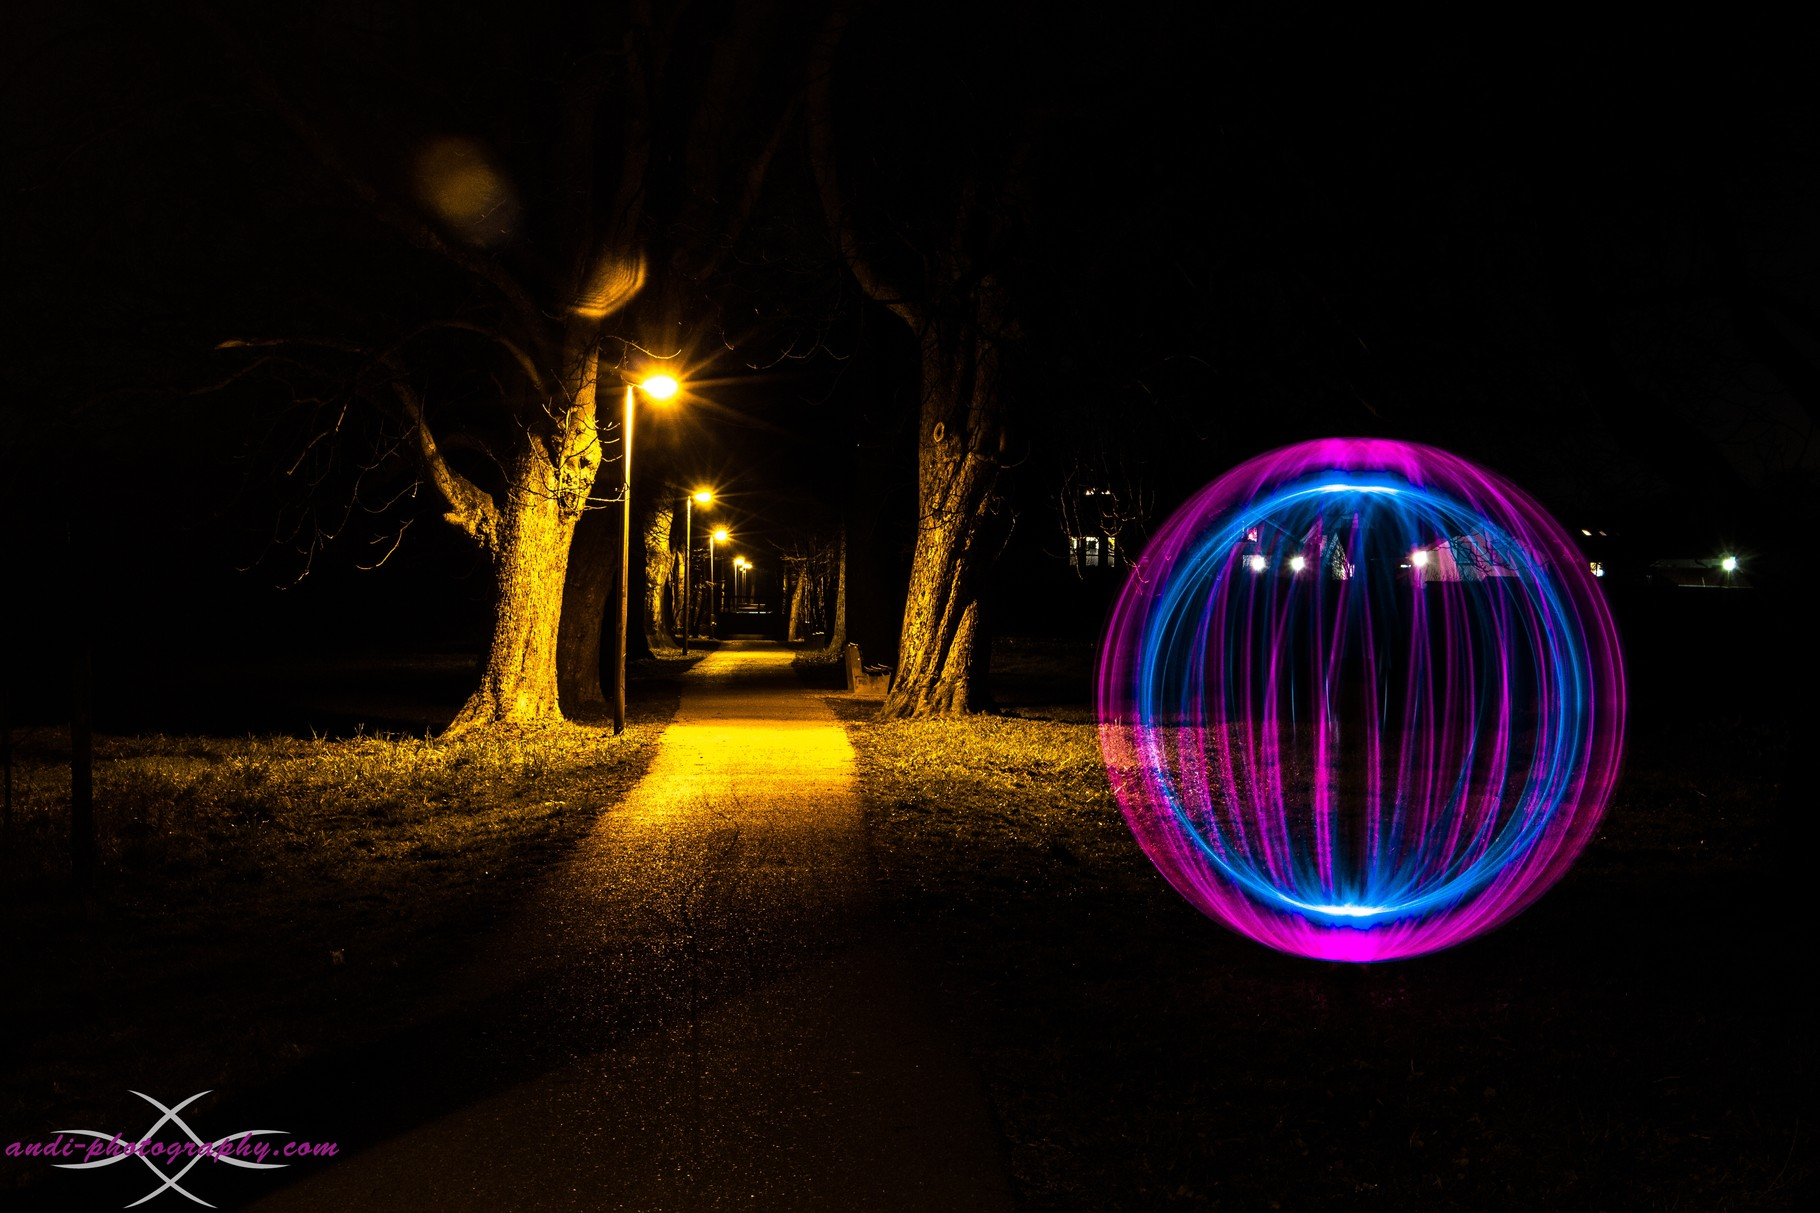 LightOrb